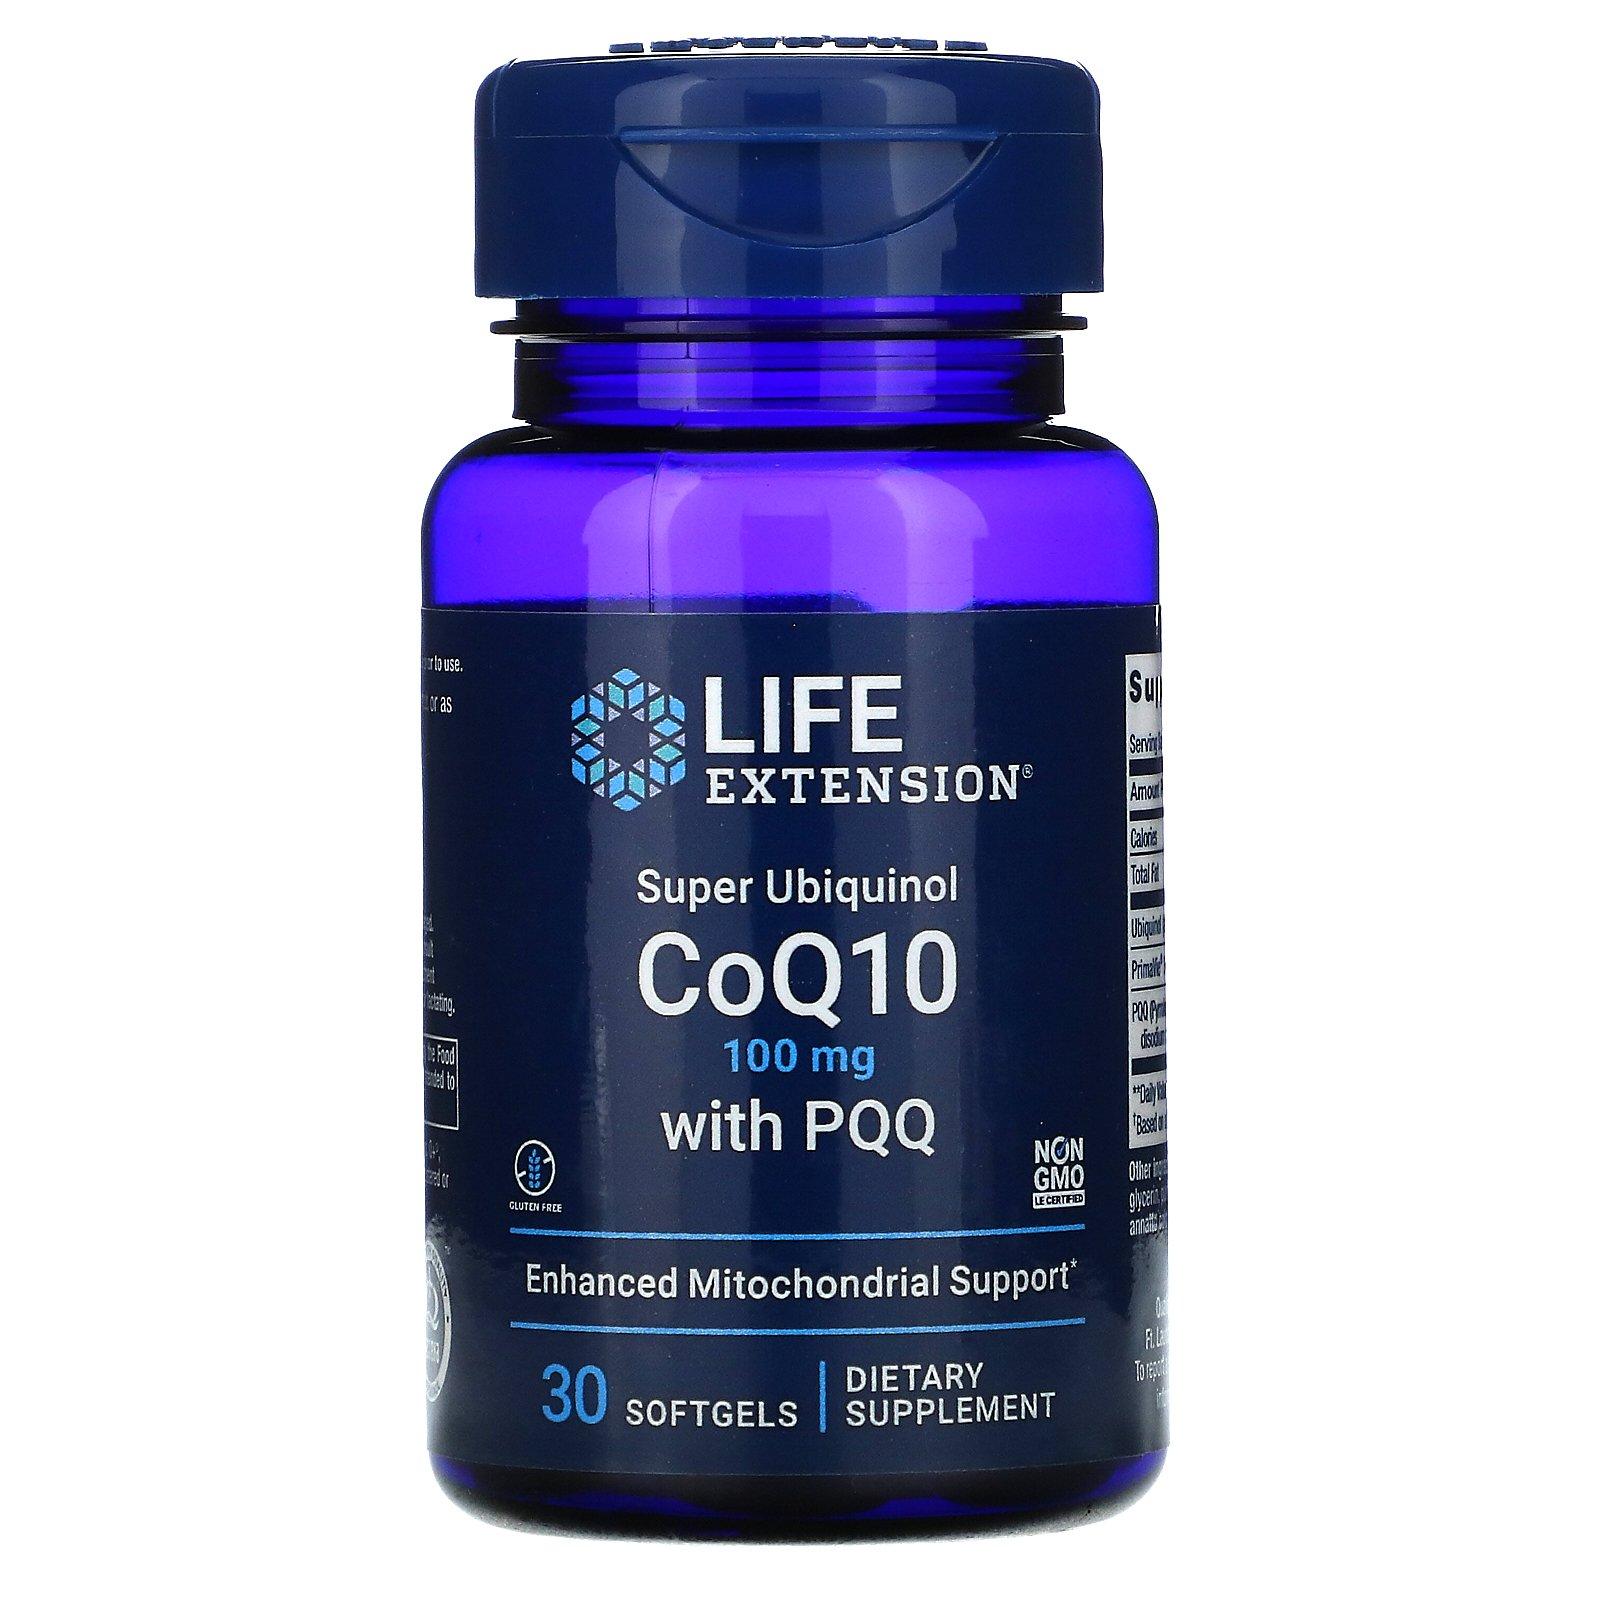 Life Extension, суперубихинол коэнзим Q10 с пирролохинолинхиноном (PQQ), 100 мг, 30 мягких таблеток